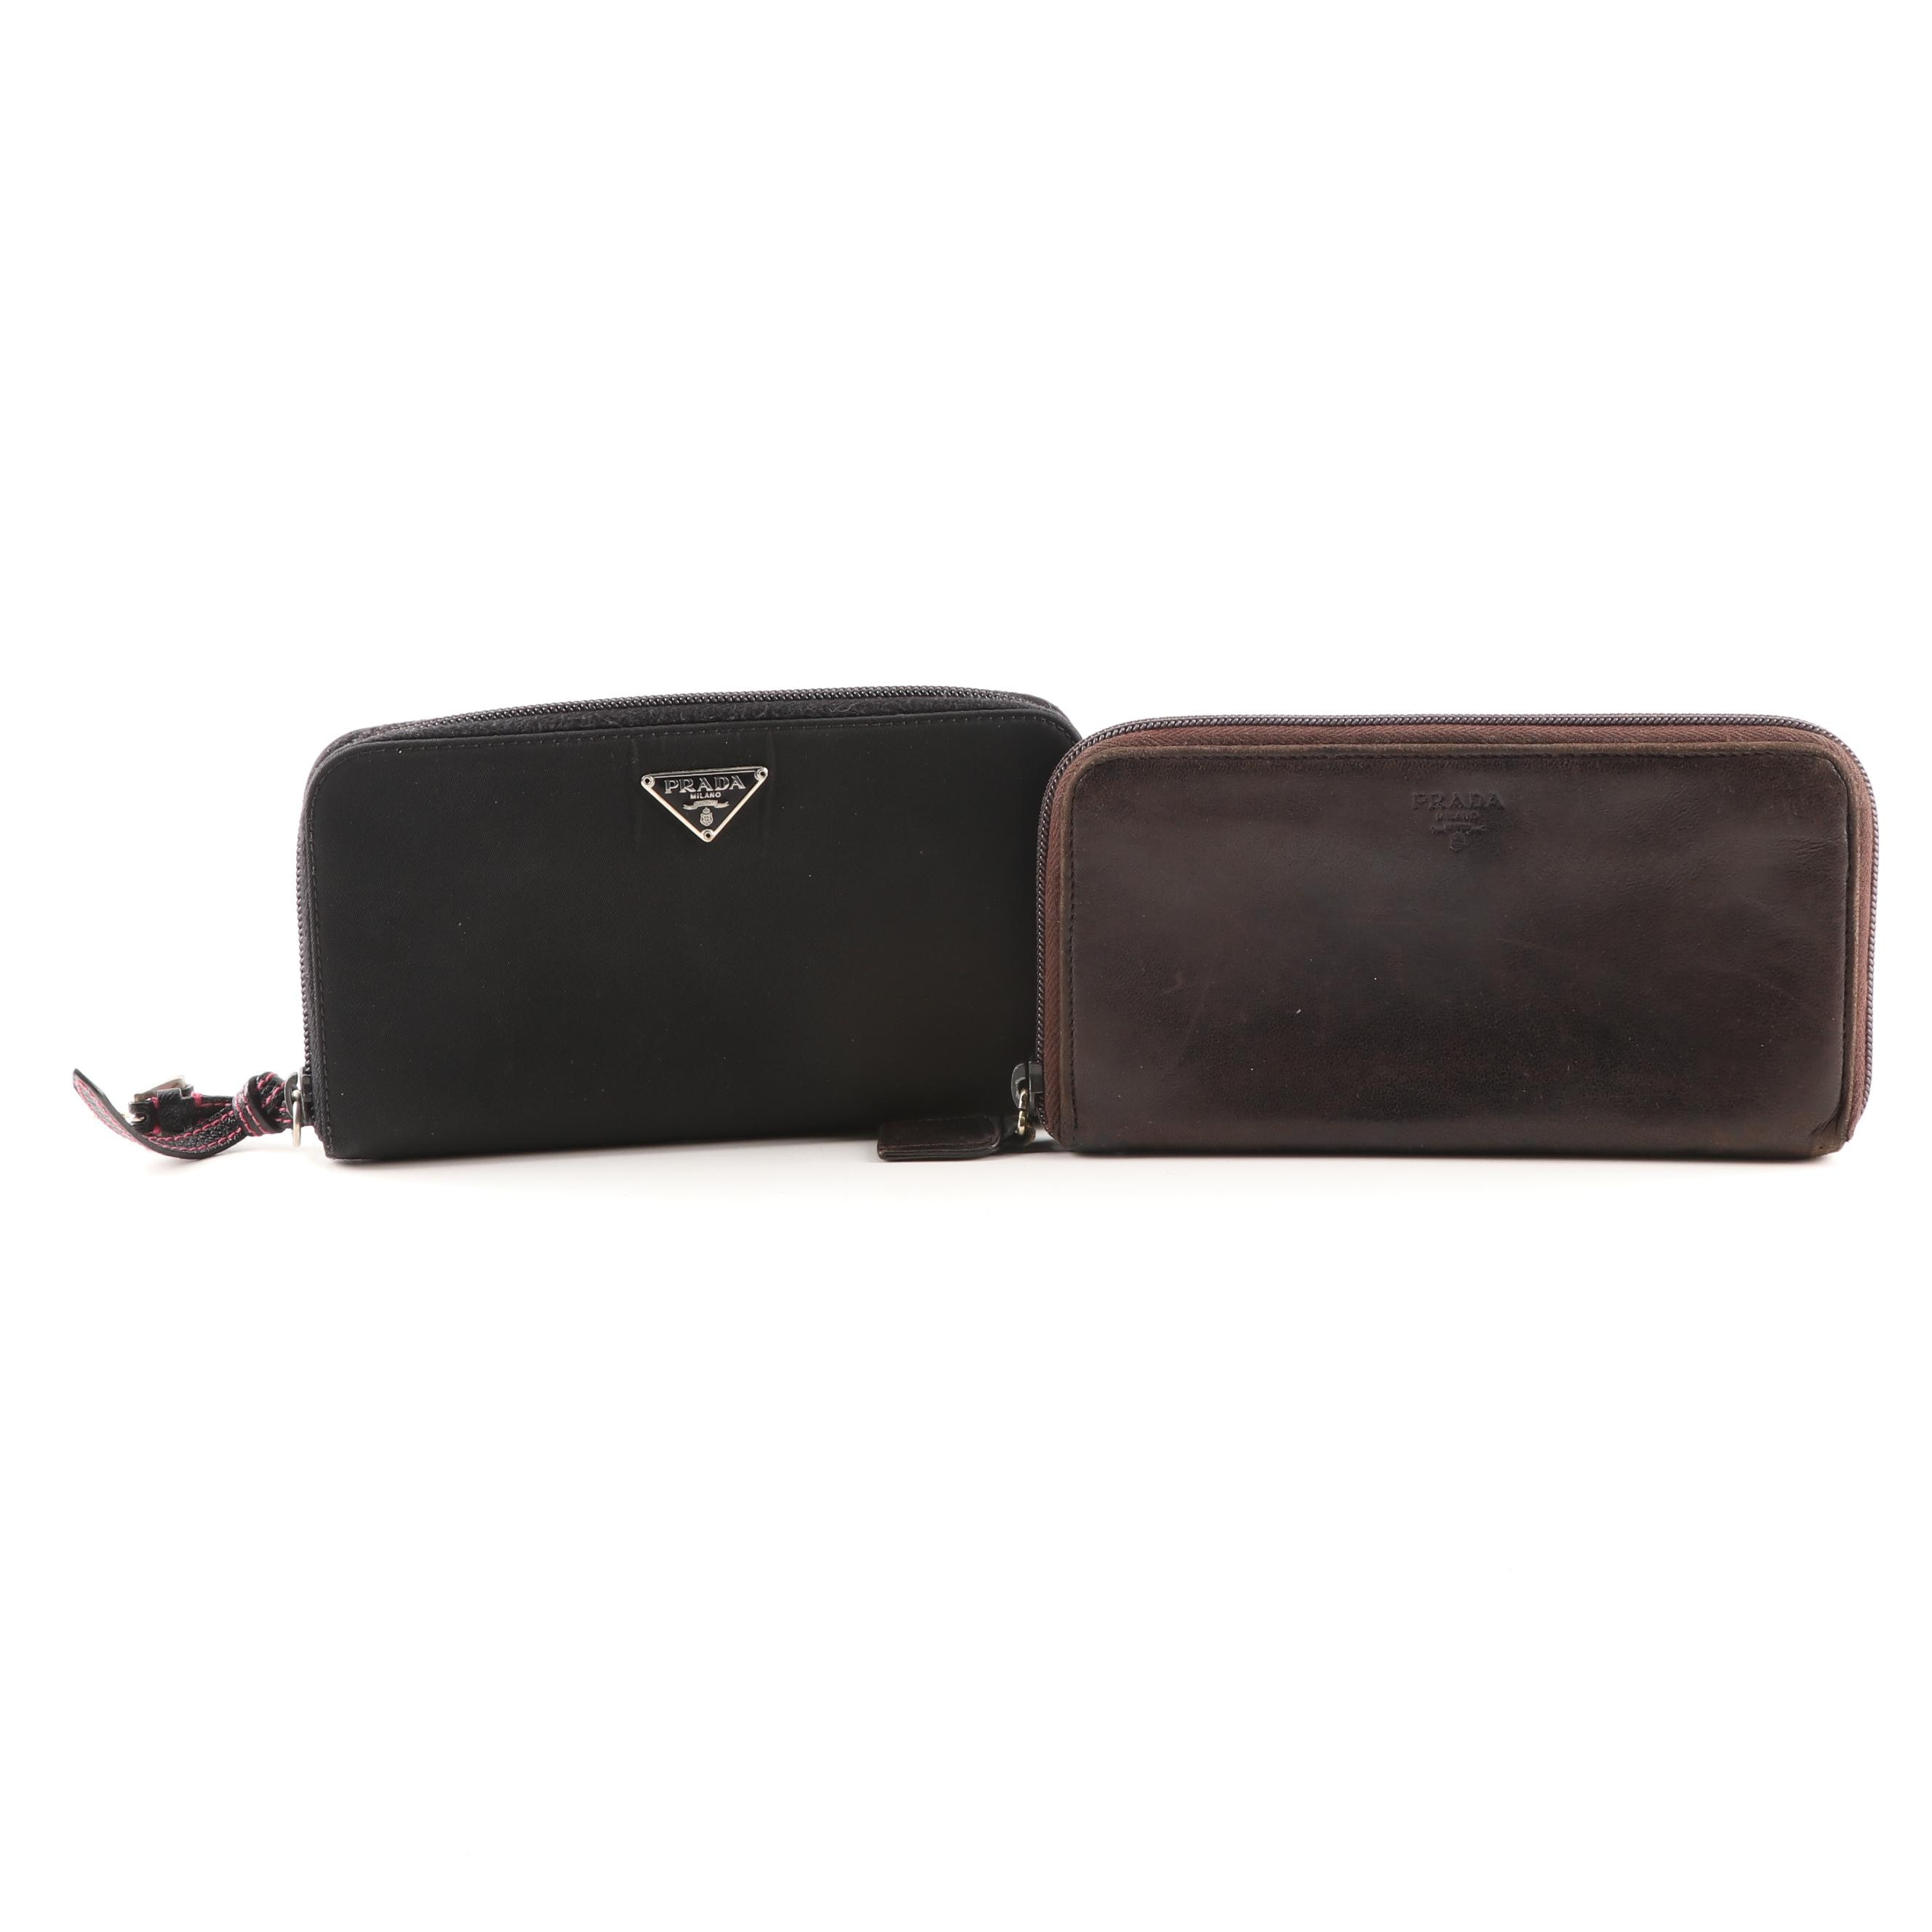 Prada Leather and Nylon Zip-Around Wallets